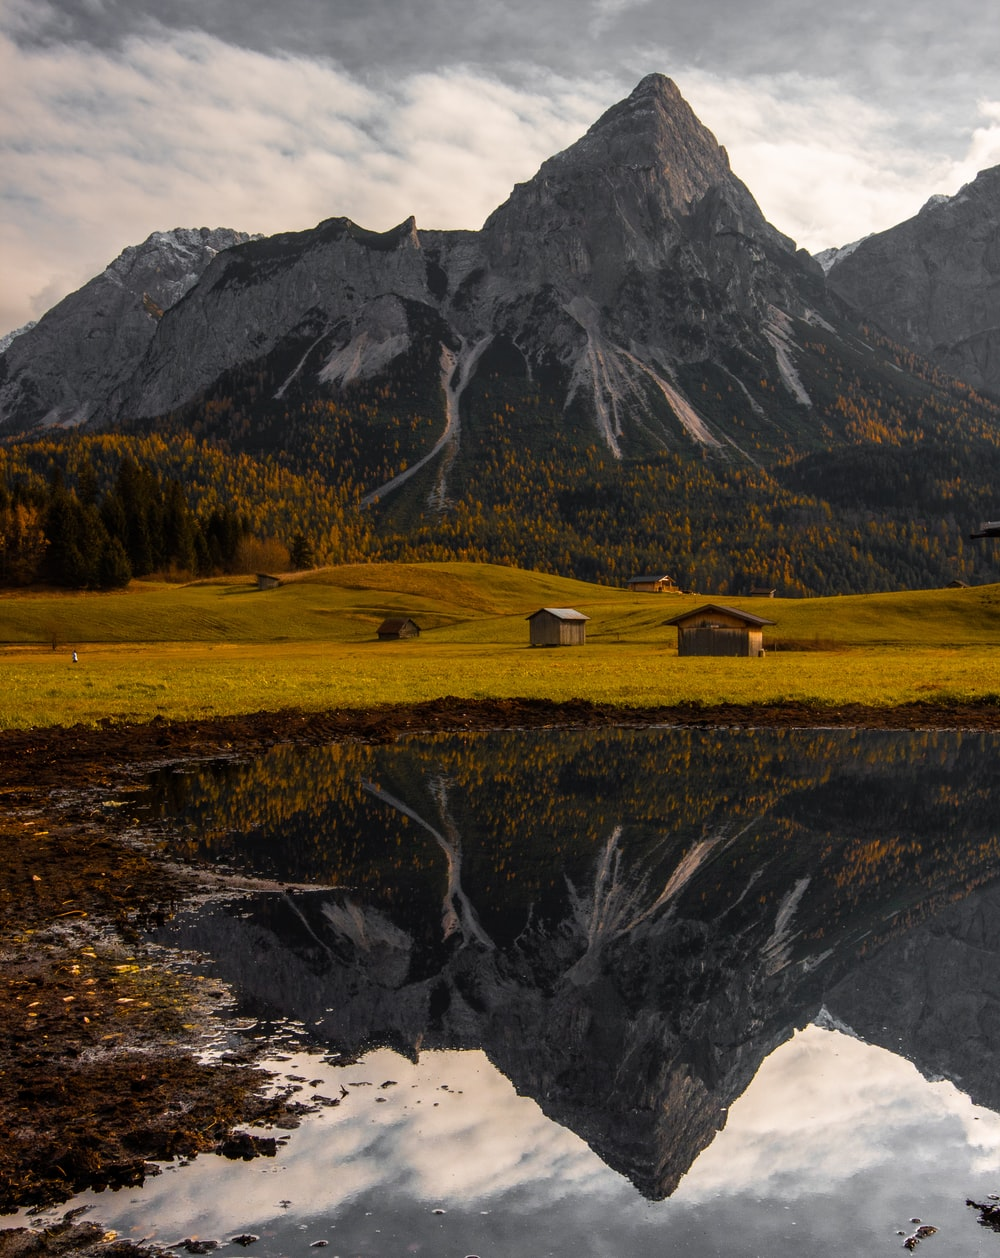 cabins in field